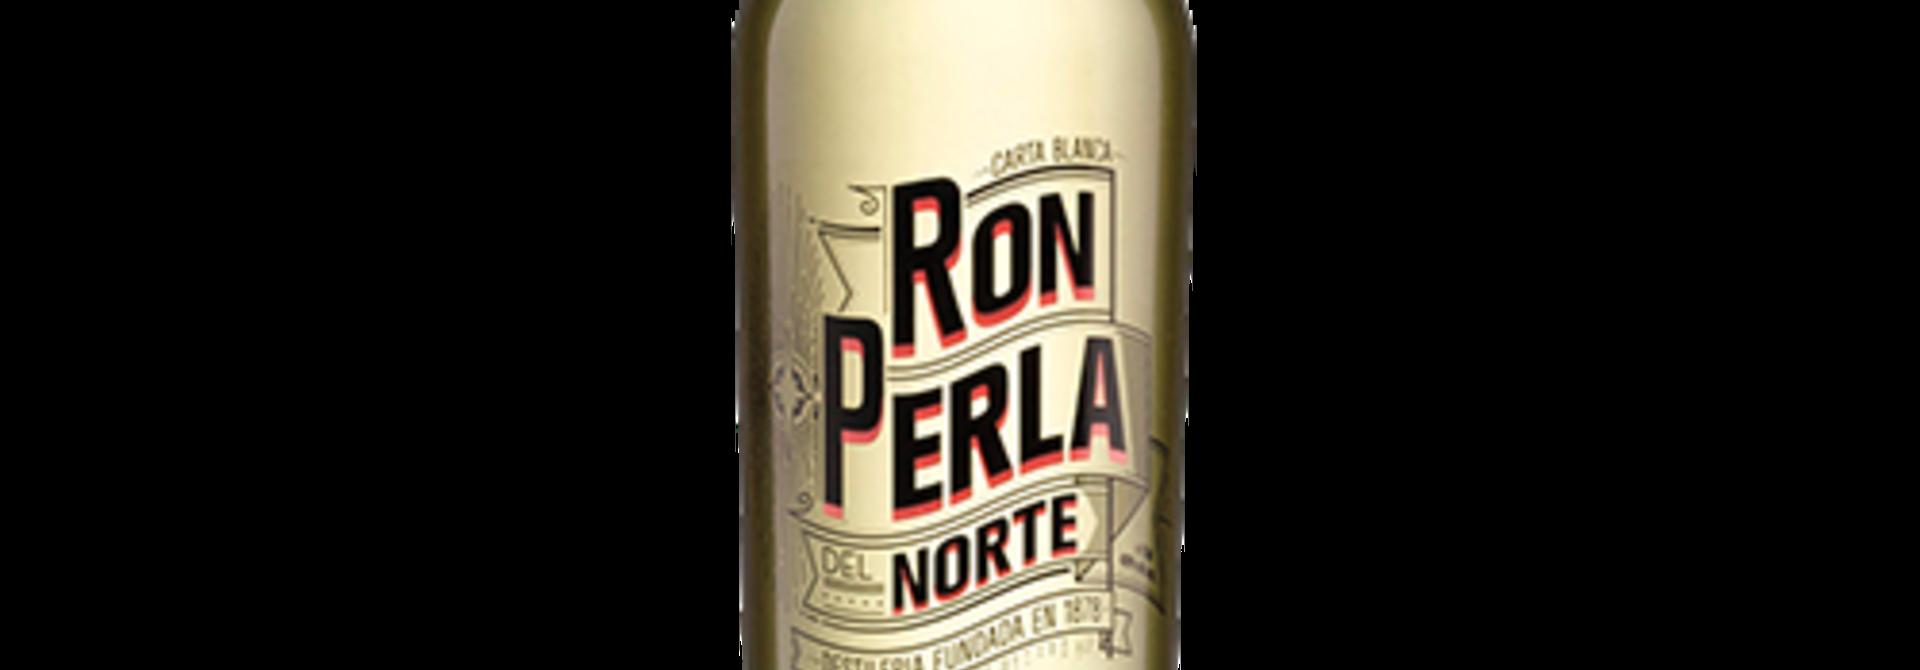 Ron Perla Carta Blanca 3 Years